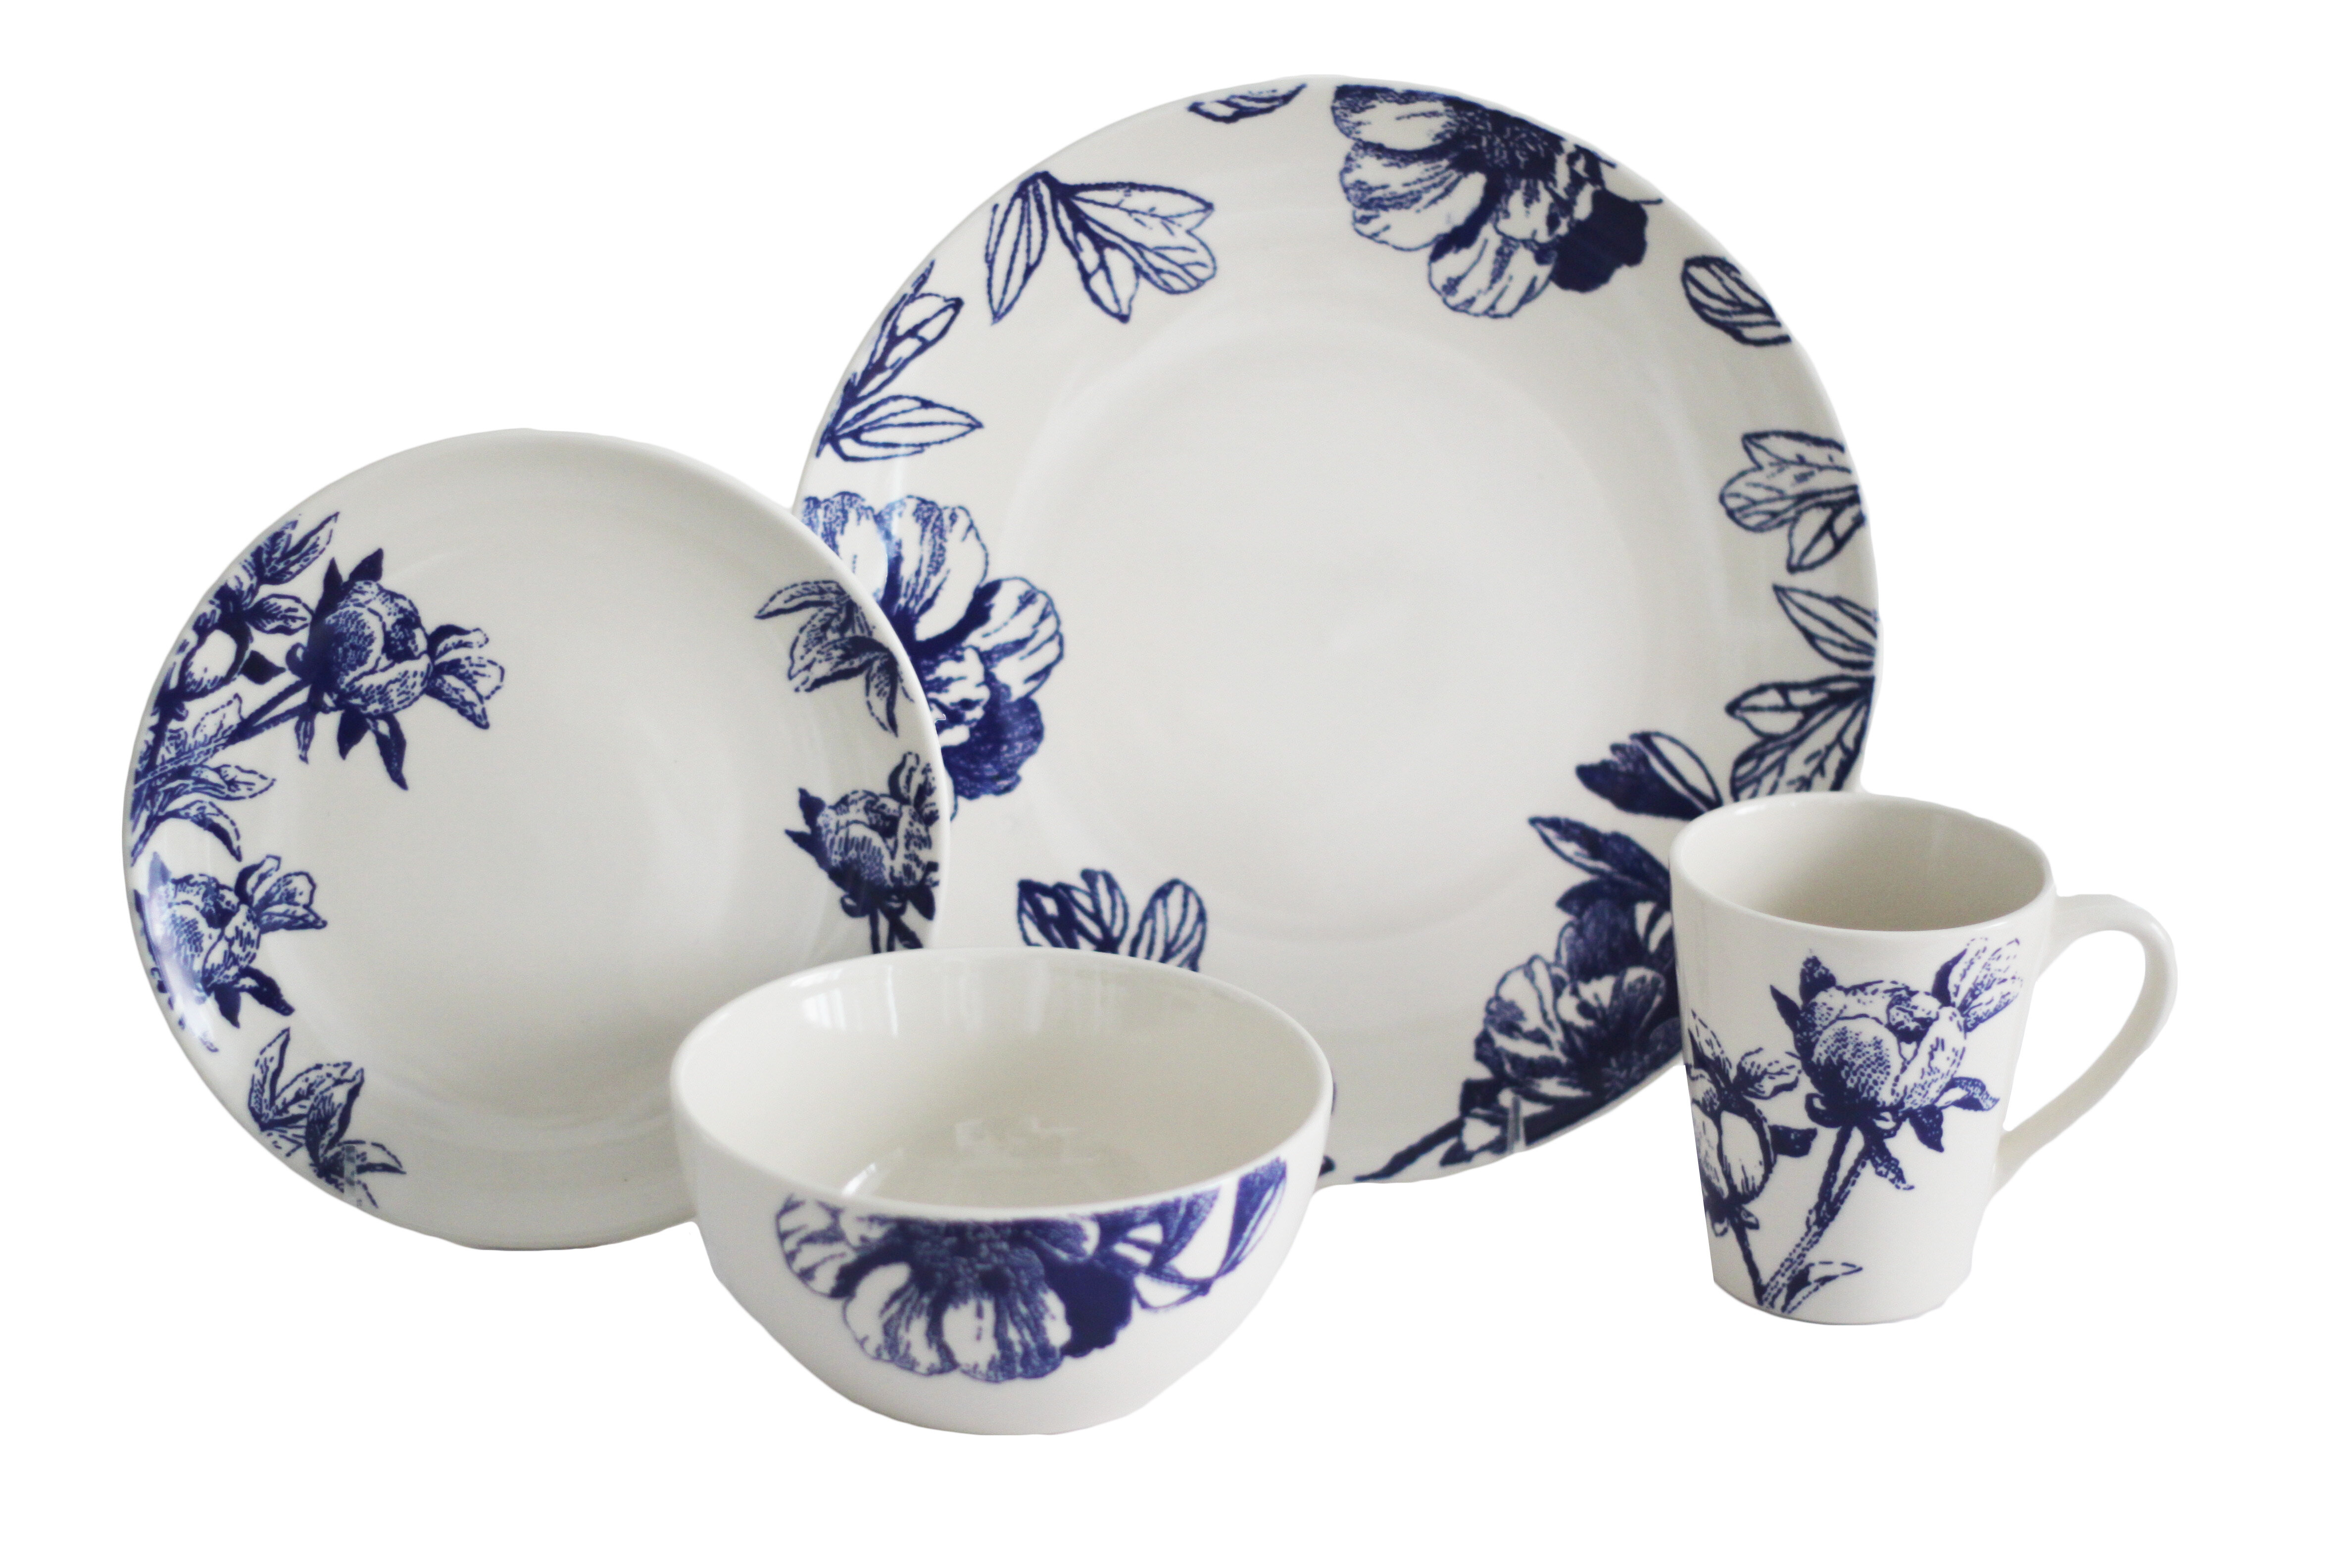 sc 1 st  Joss u0026 Main & Botanical 16 Piece Dinnerware Set Service for 4 | Joss u0026 Main